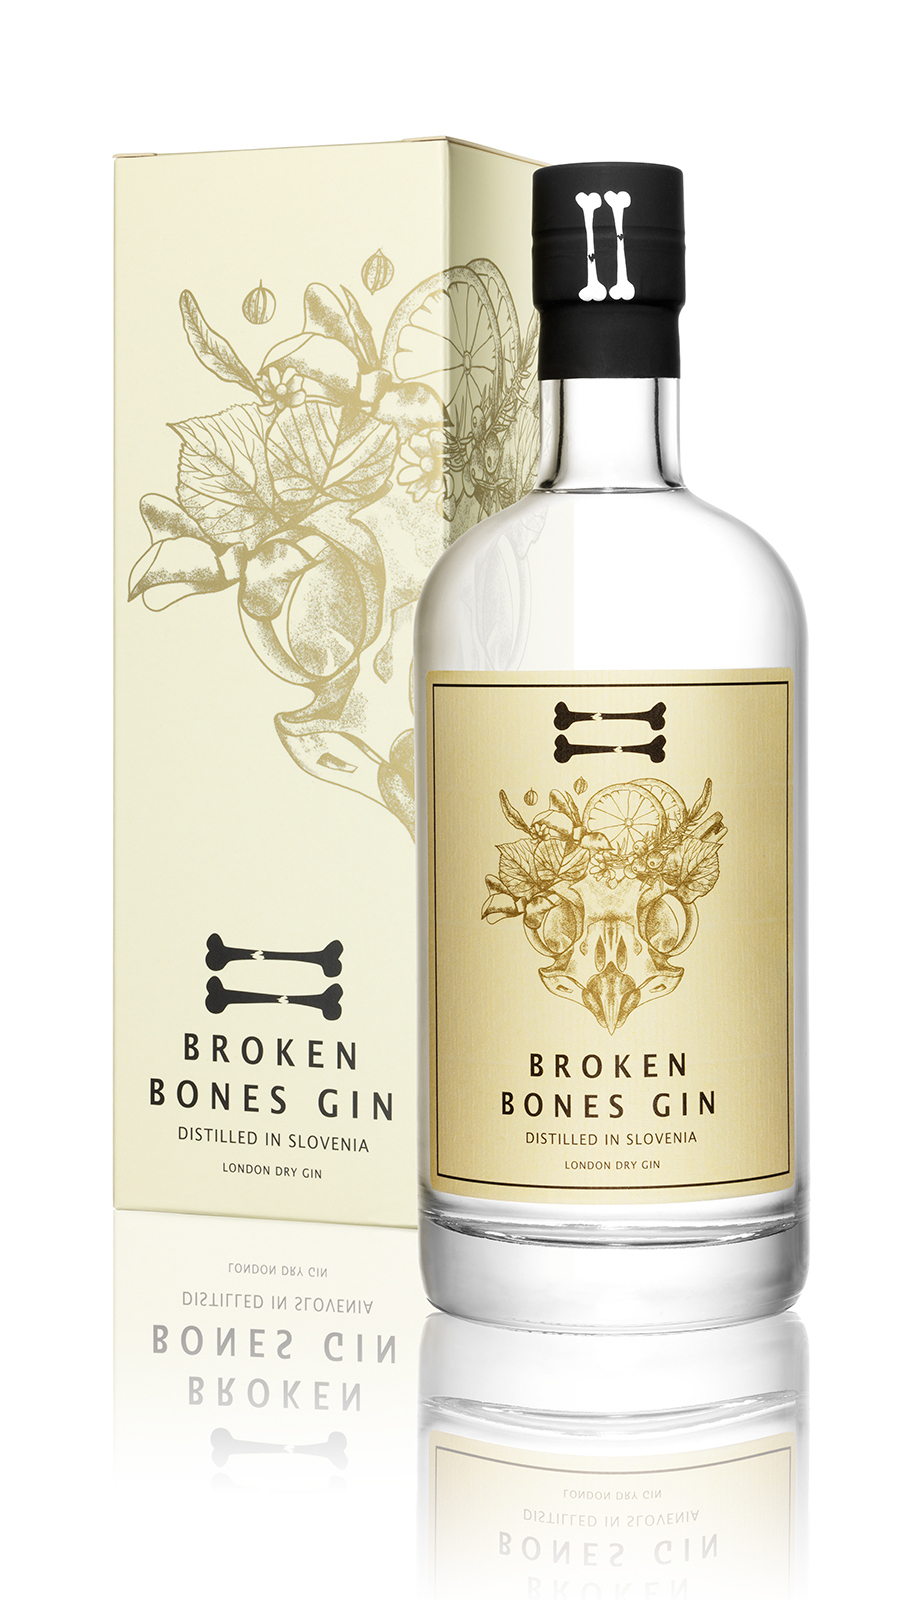 Broken Bones London Dry Gin